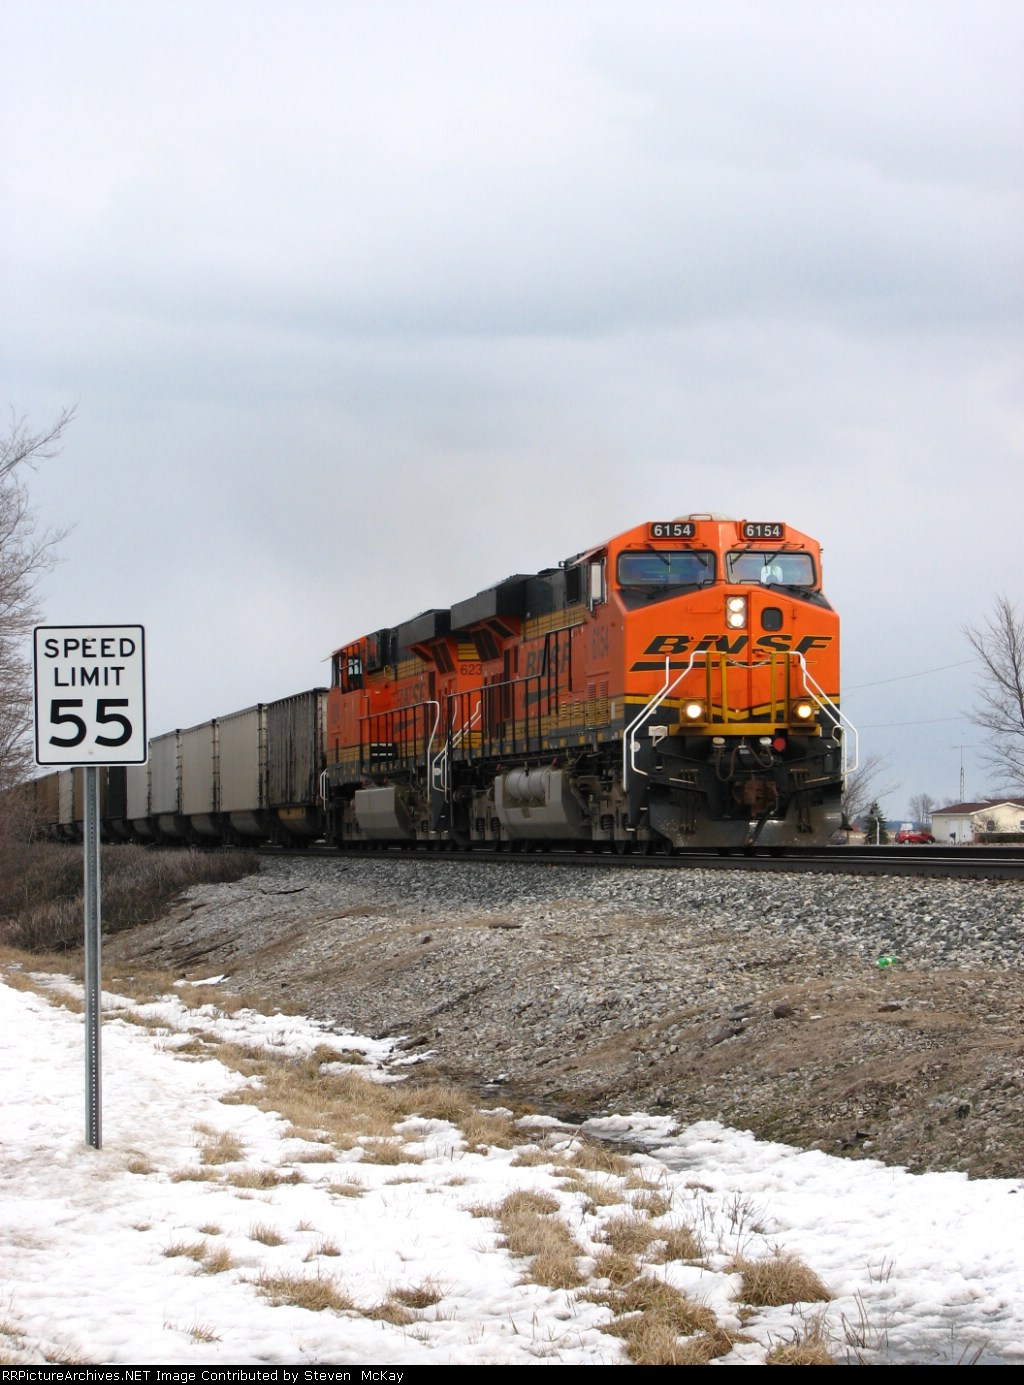 BNSF 6154